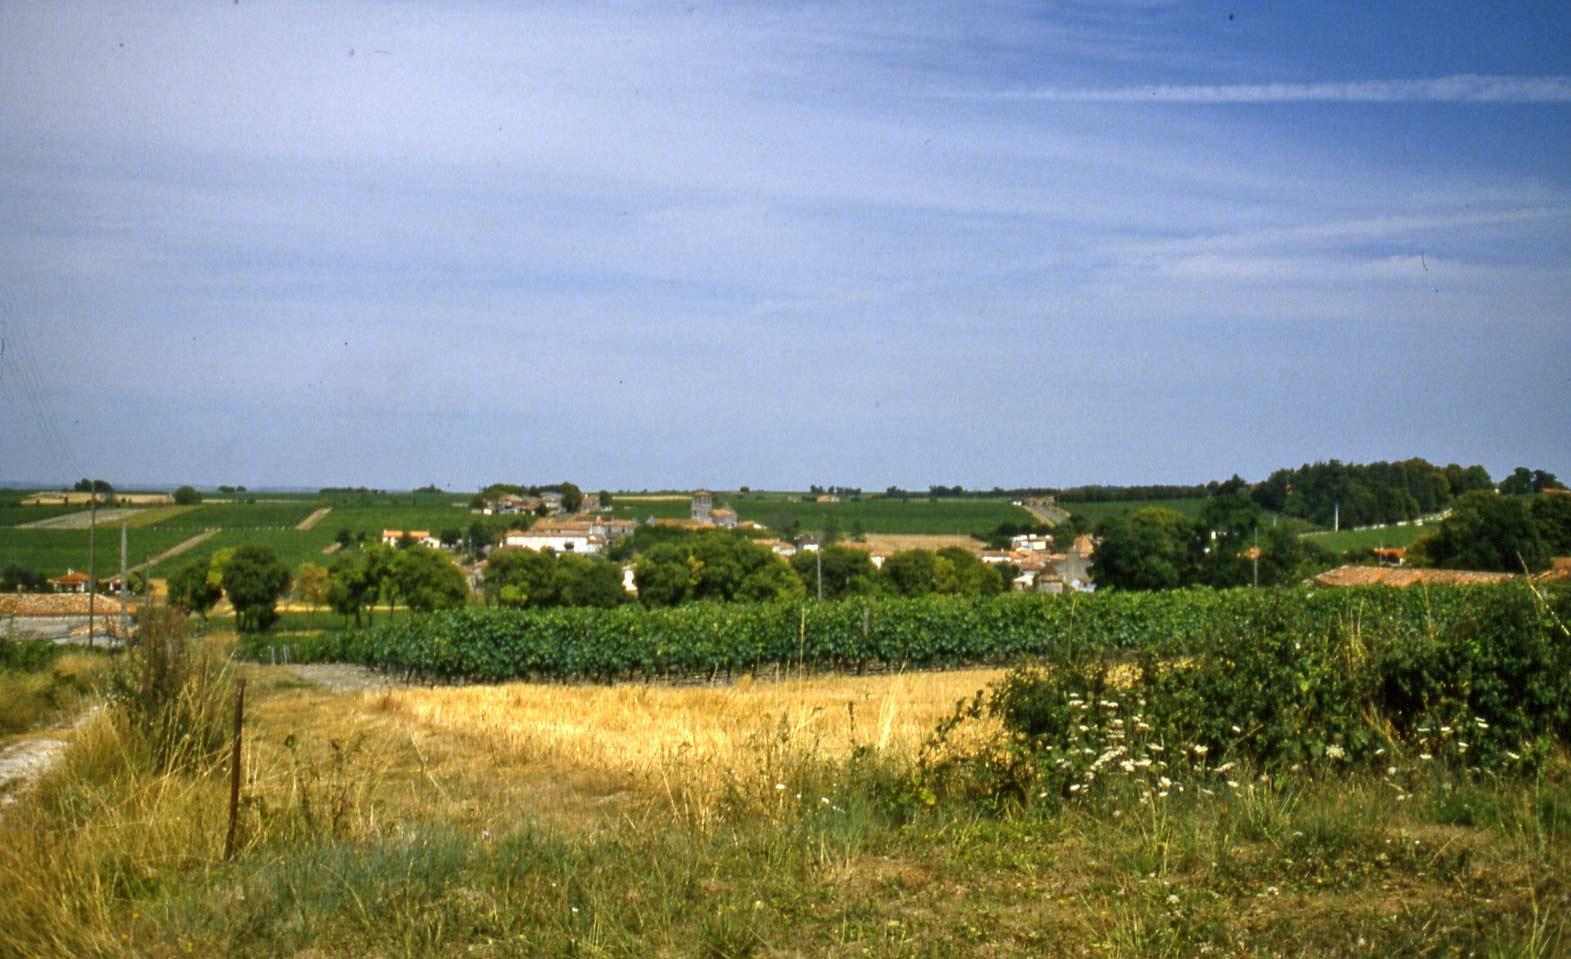 Le vignoble de La Pouyade ... en août 1986